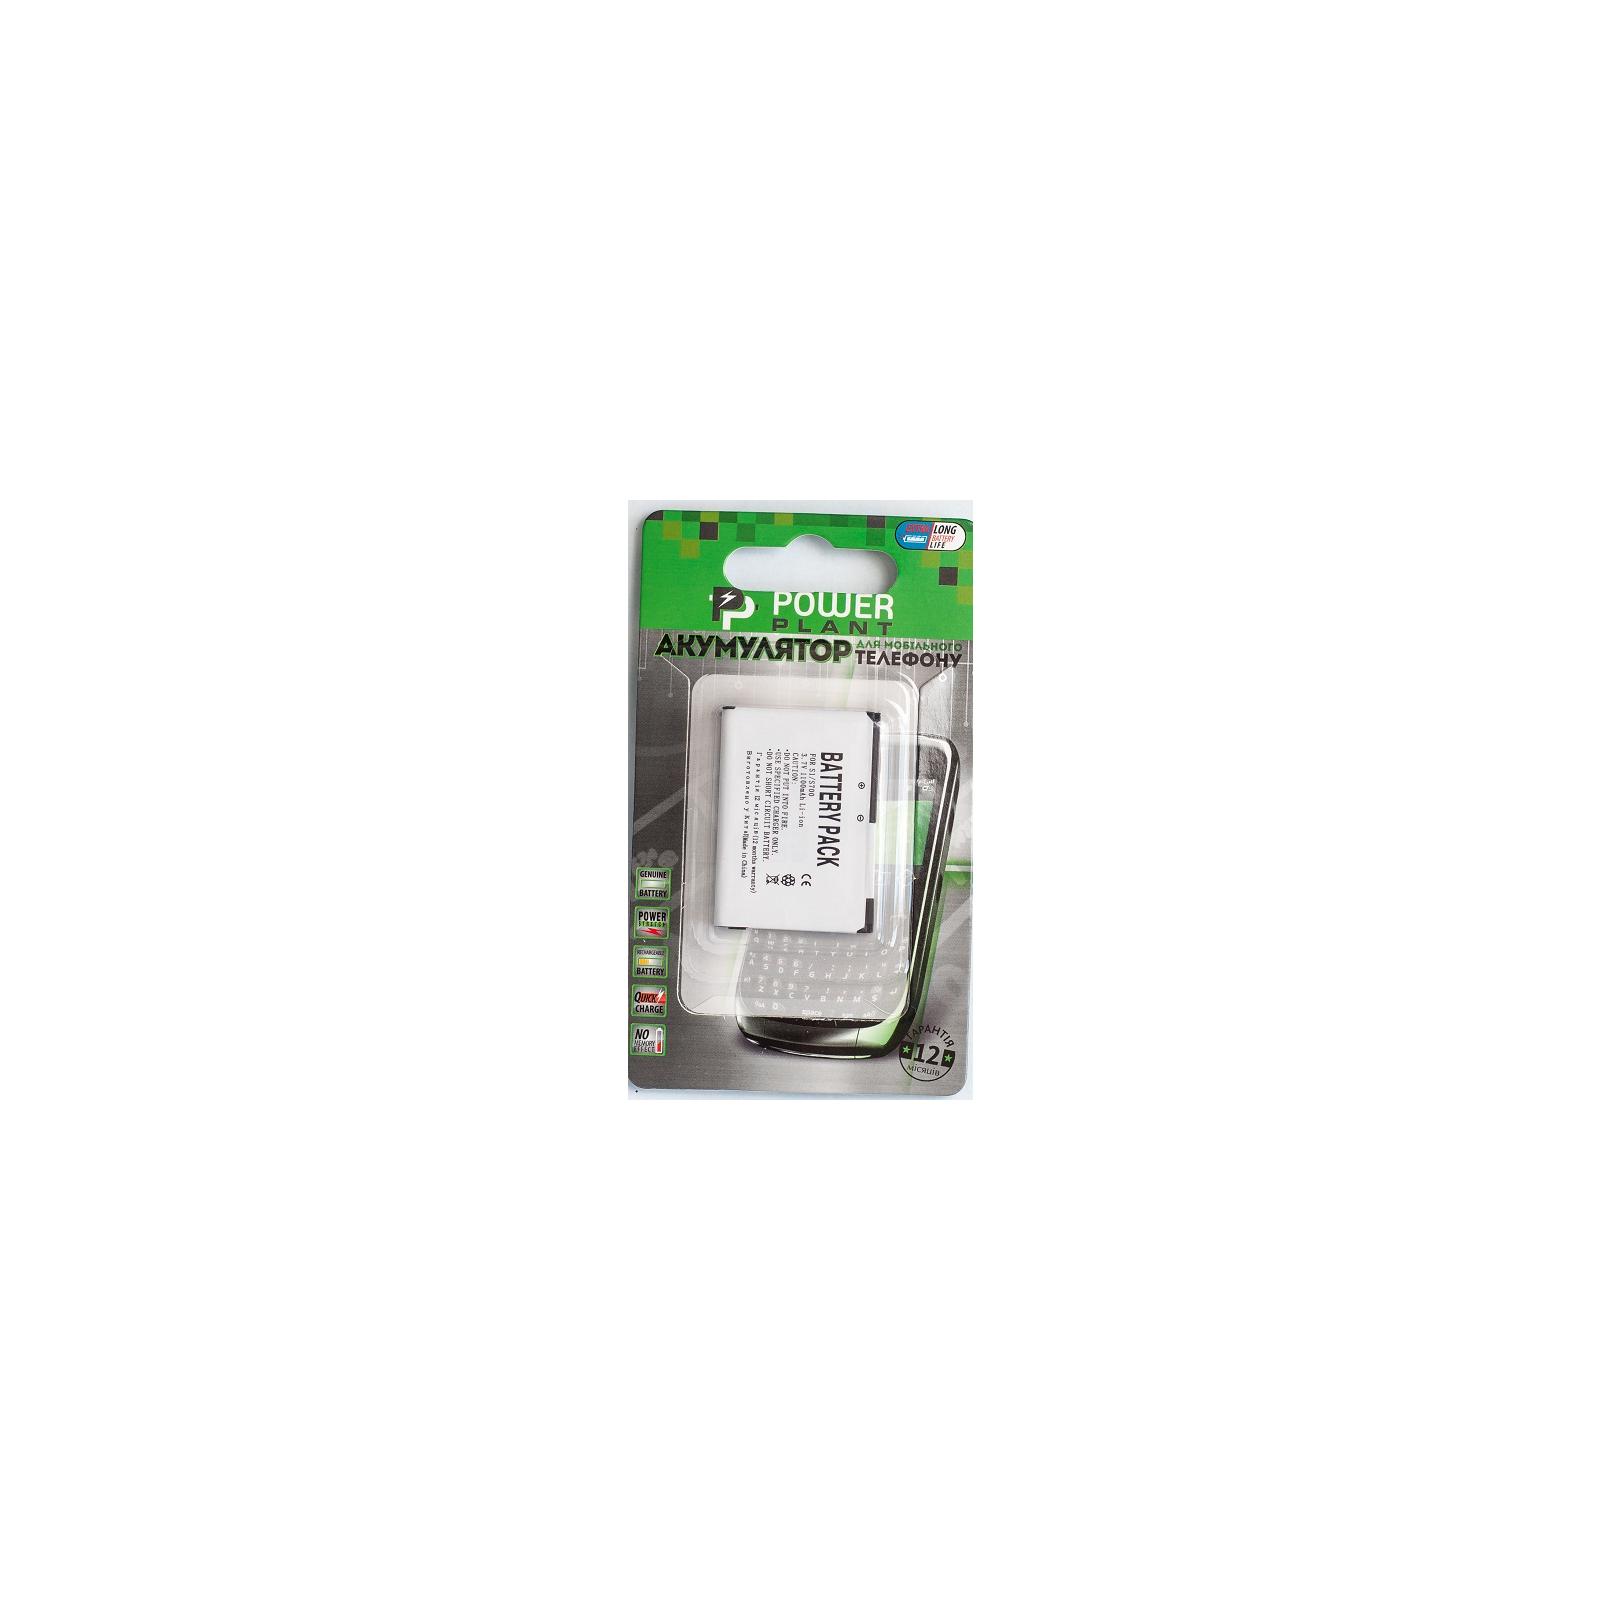 Аккумуляторная батарея PowerPlant HTC ELF0160 (S1, S700, S500, S505, P3450, P3452, VX6900) (DV00DV6161)